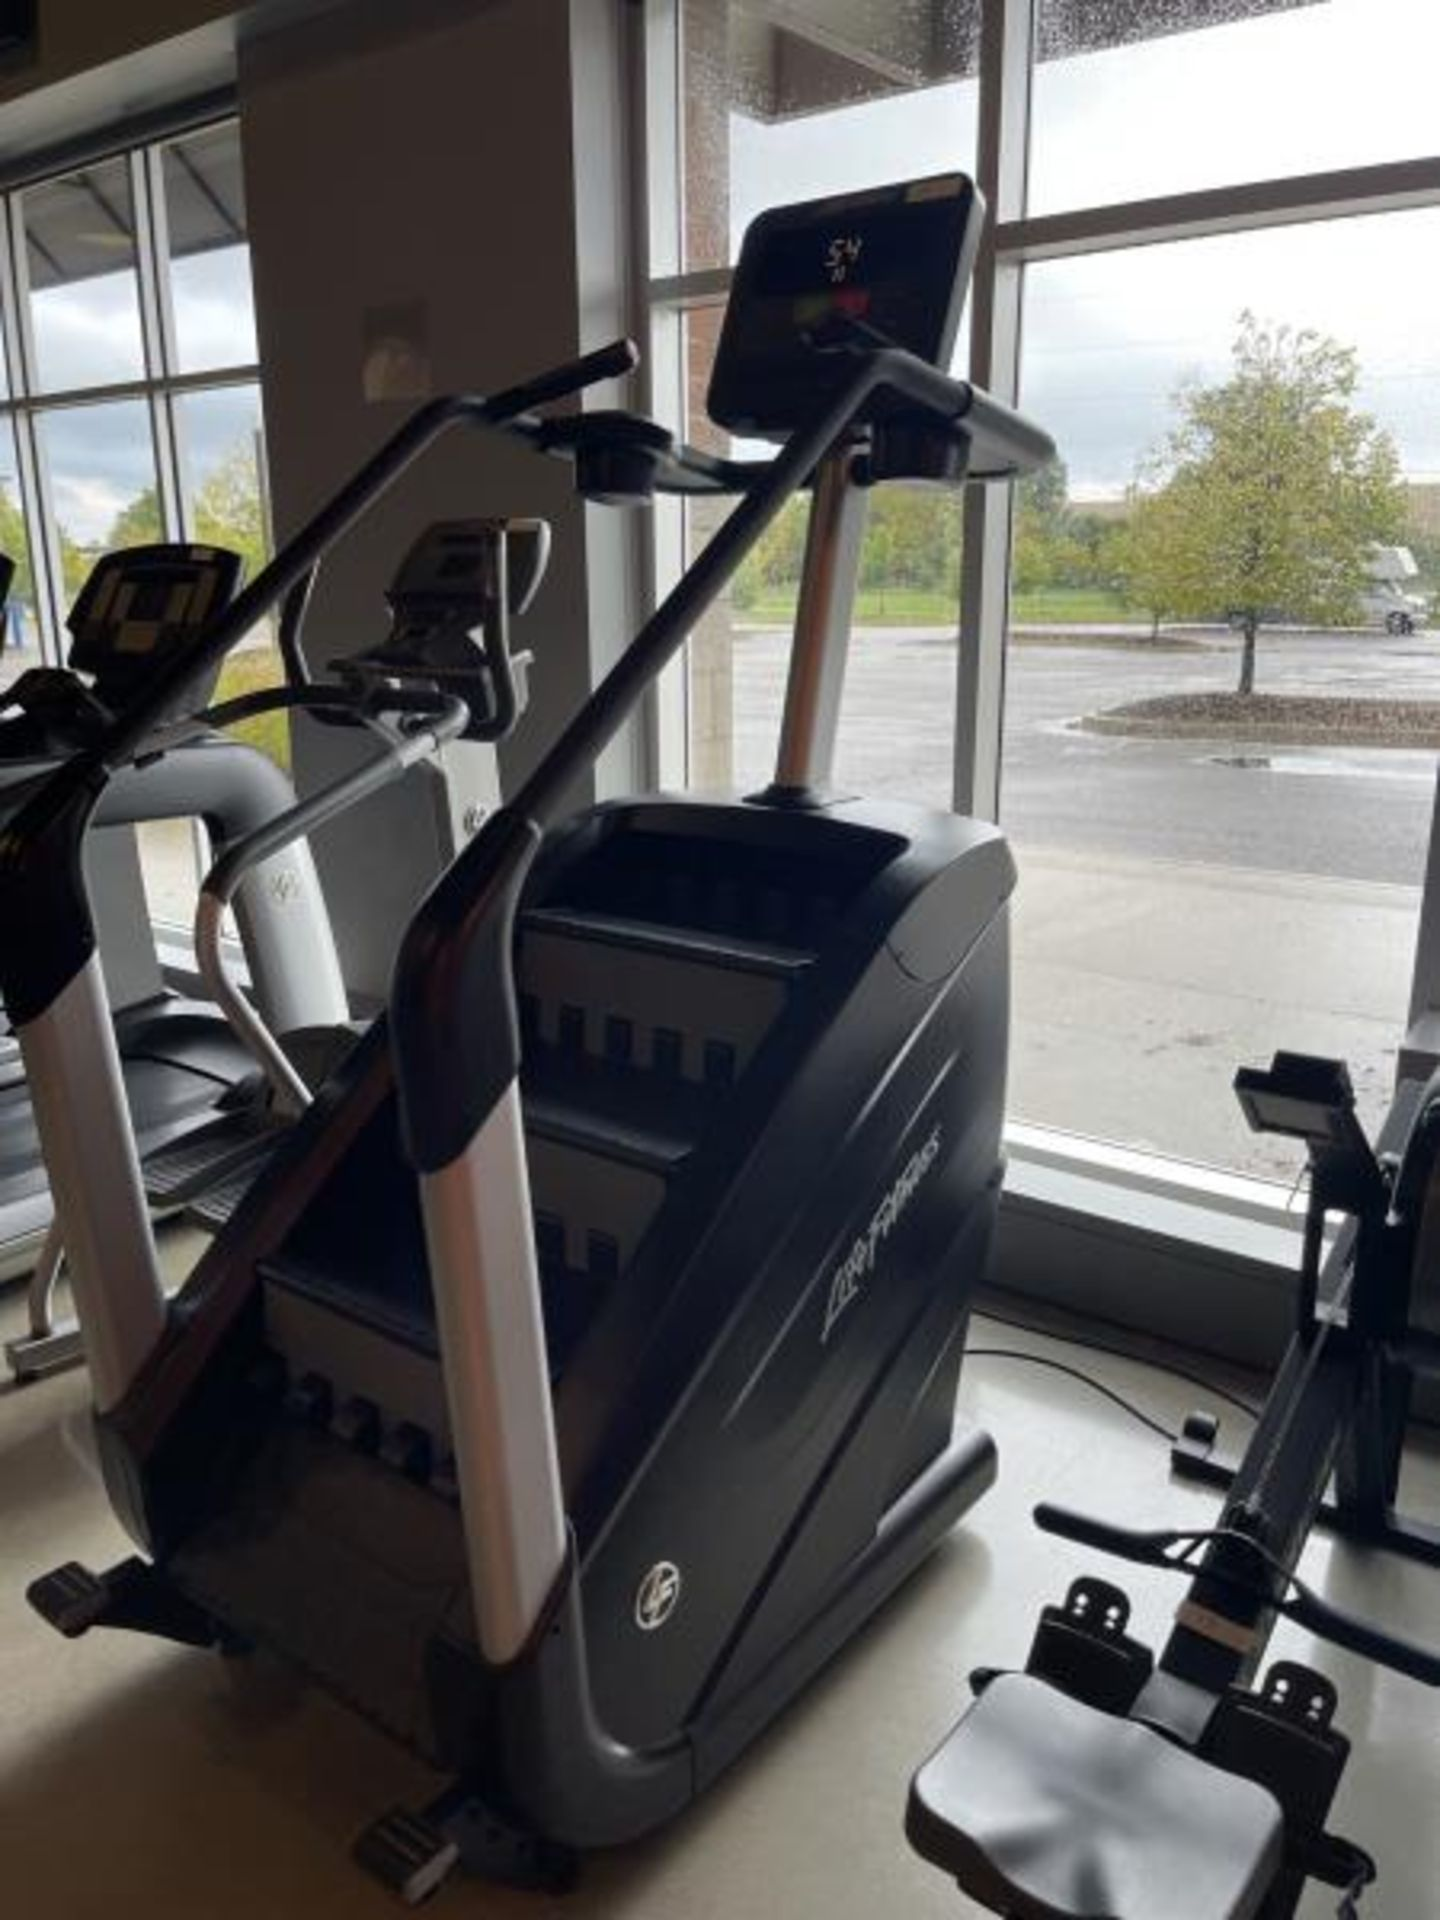 Life Fitness Powermill SN: PMH103963 - Image 7 of 7